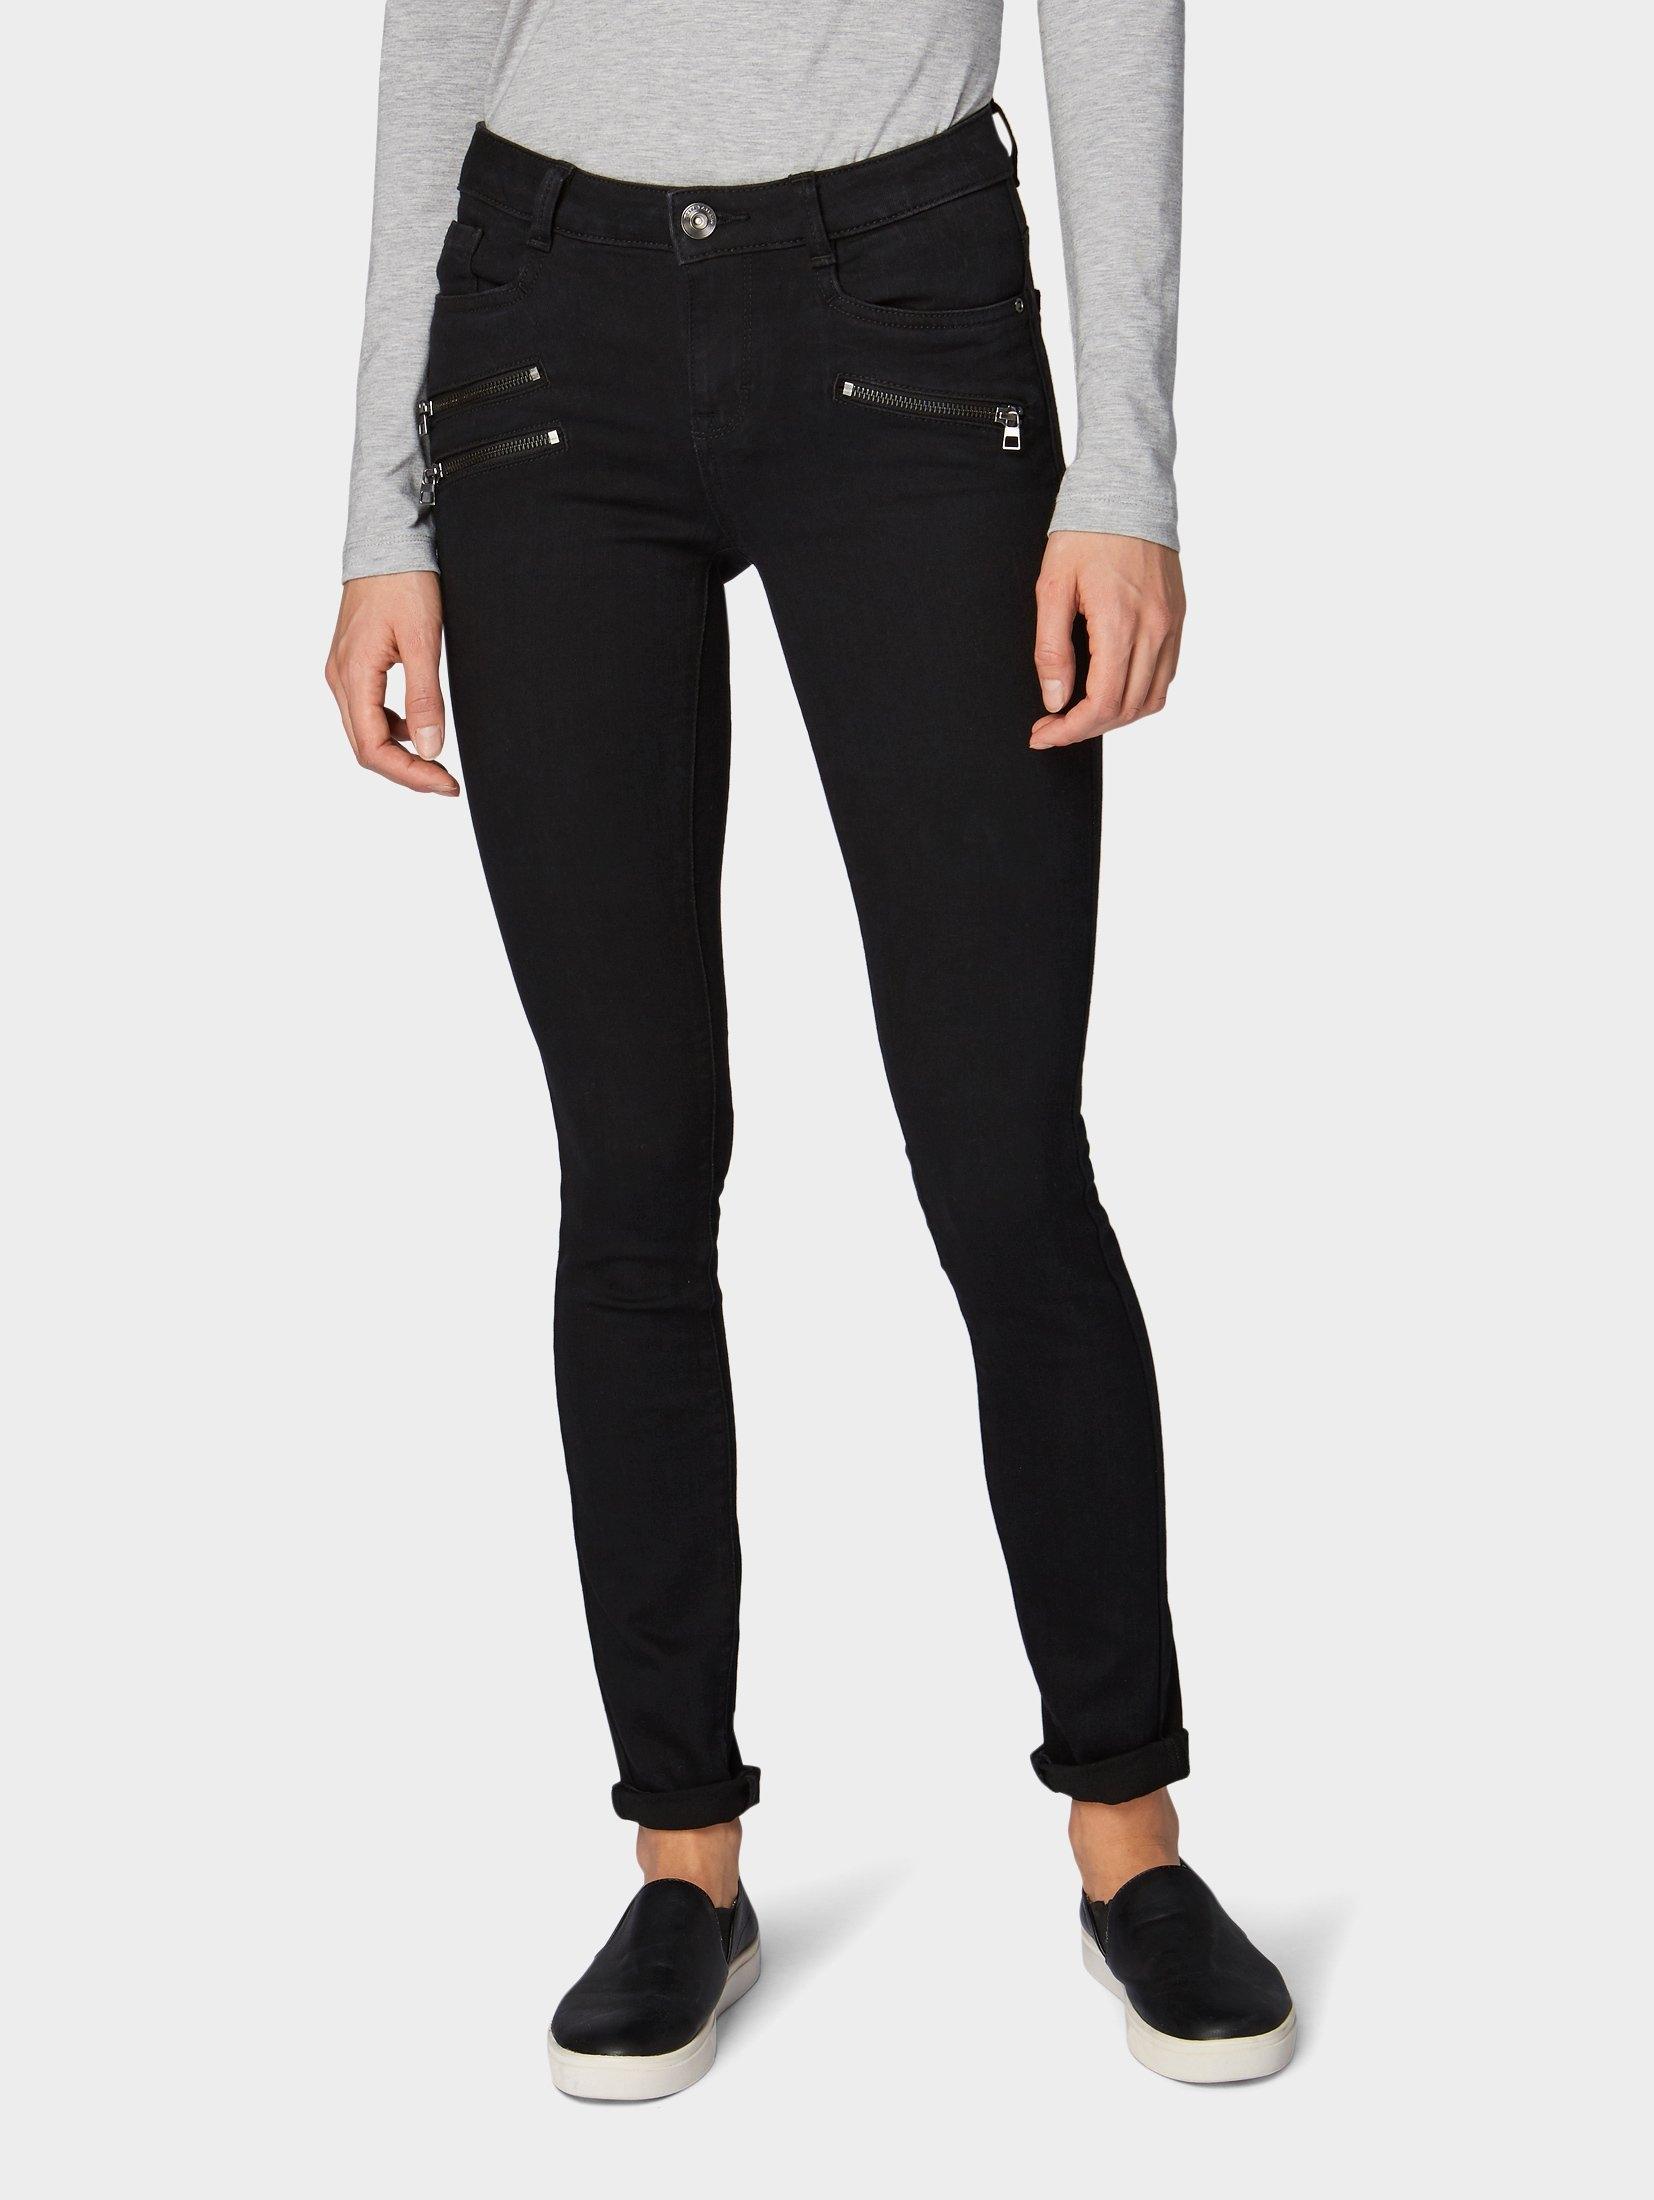 TOM TAILOR skinny fit jeans »Alexa Skinny Jeans« in de webshop van OTTO kopen